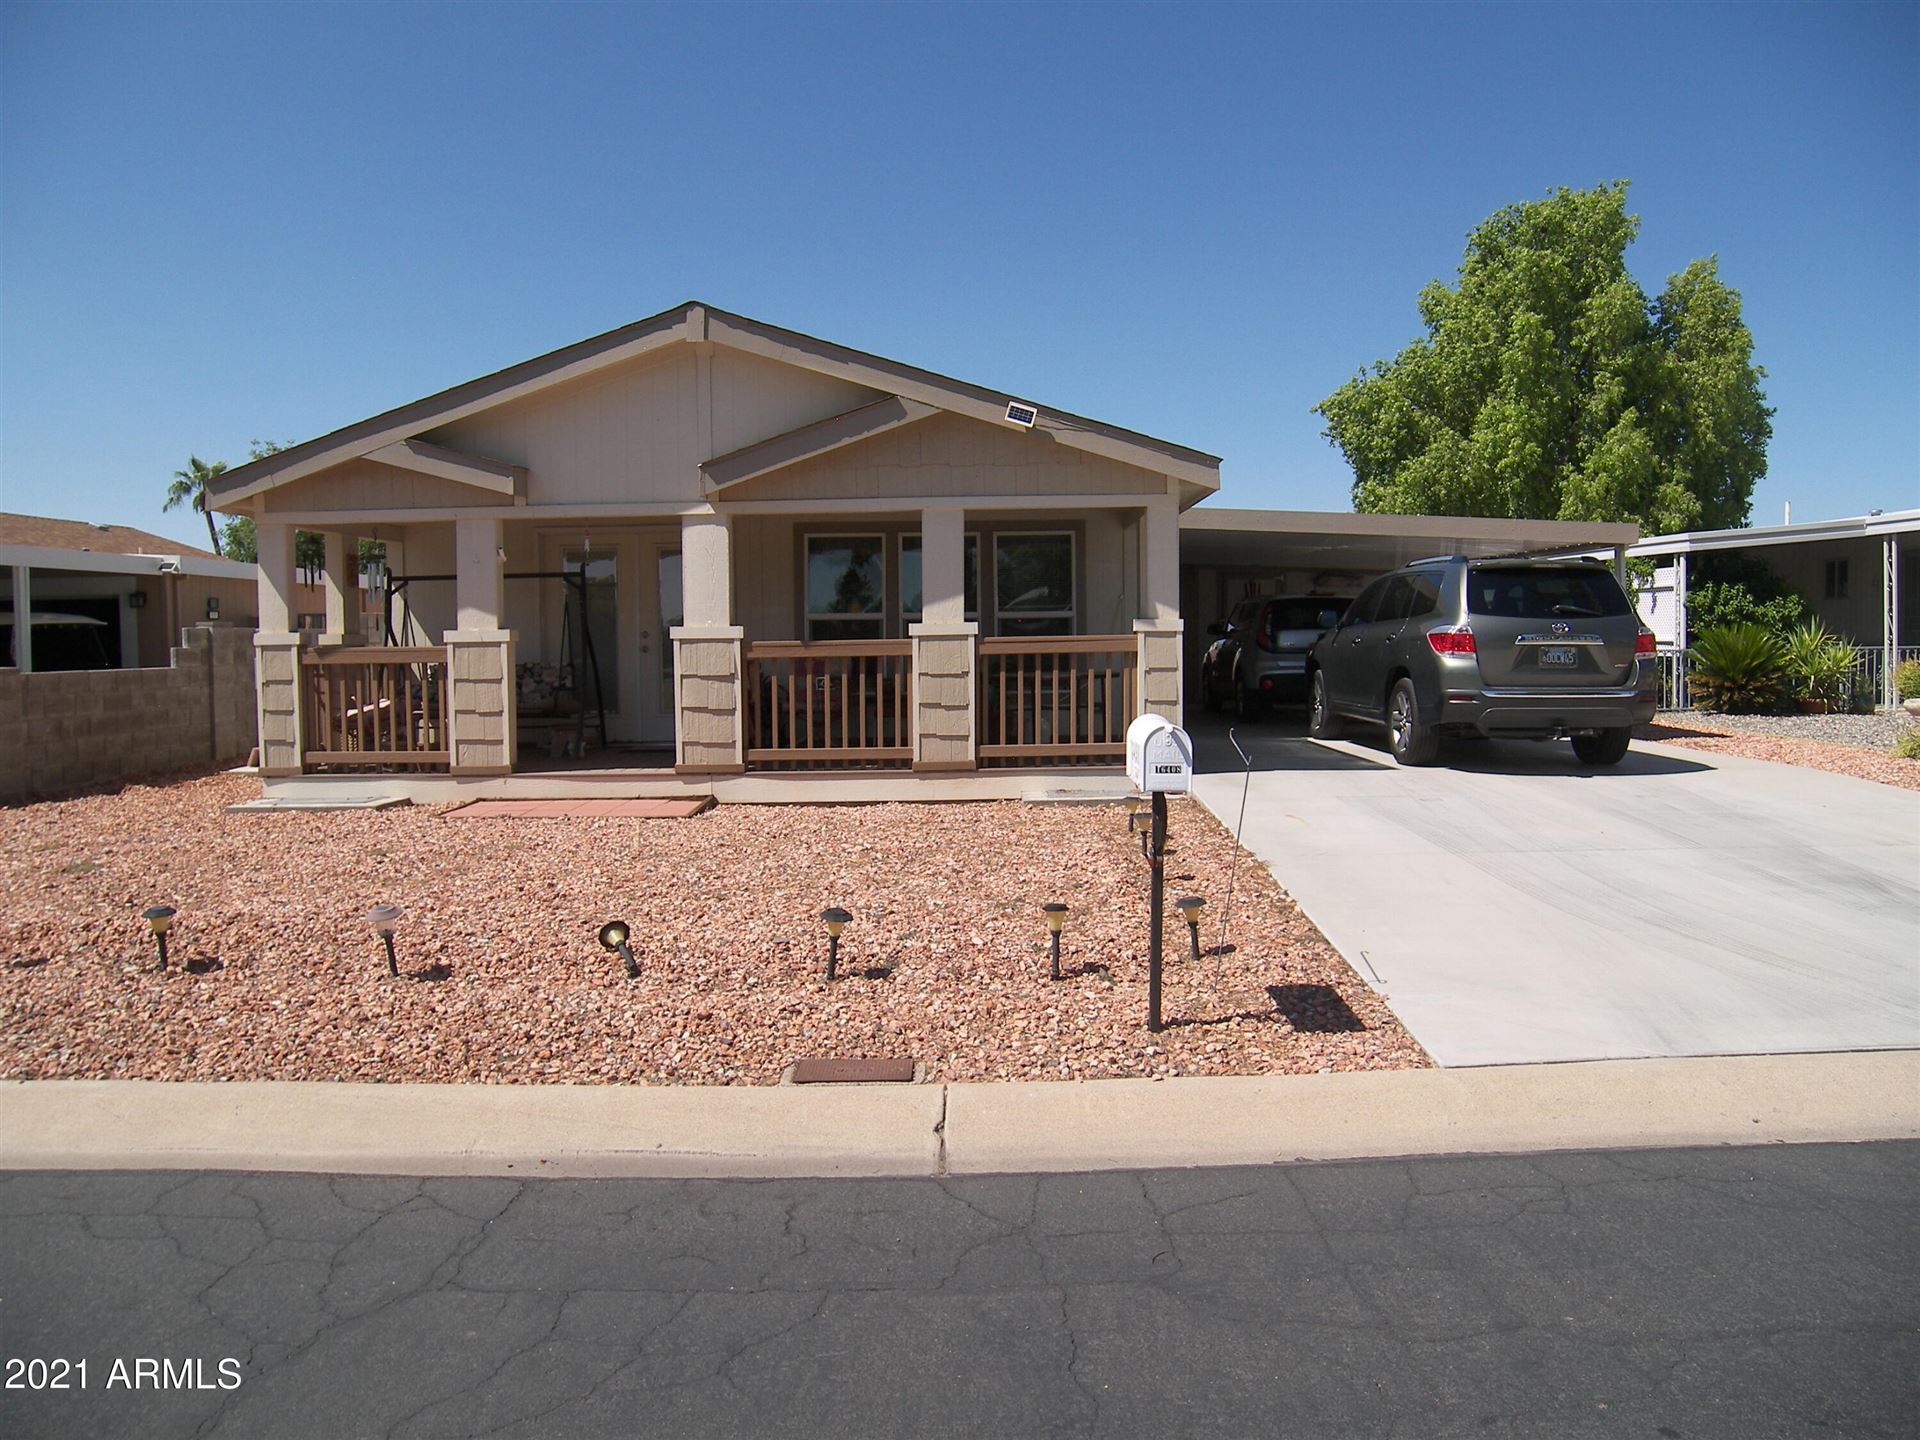 16408 N 33RD Way, Phoenix, AZ 85032 - MLS#: 6296400